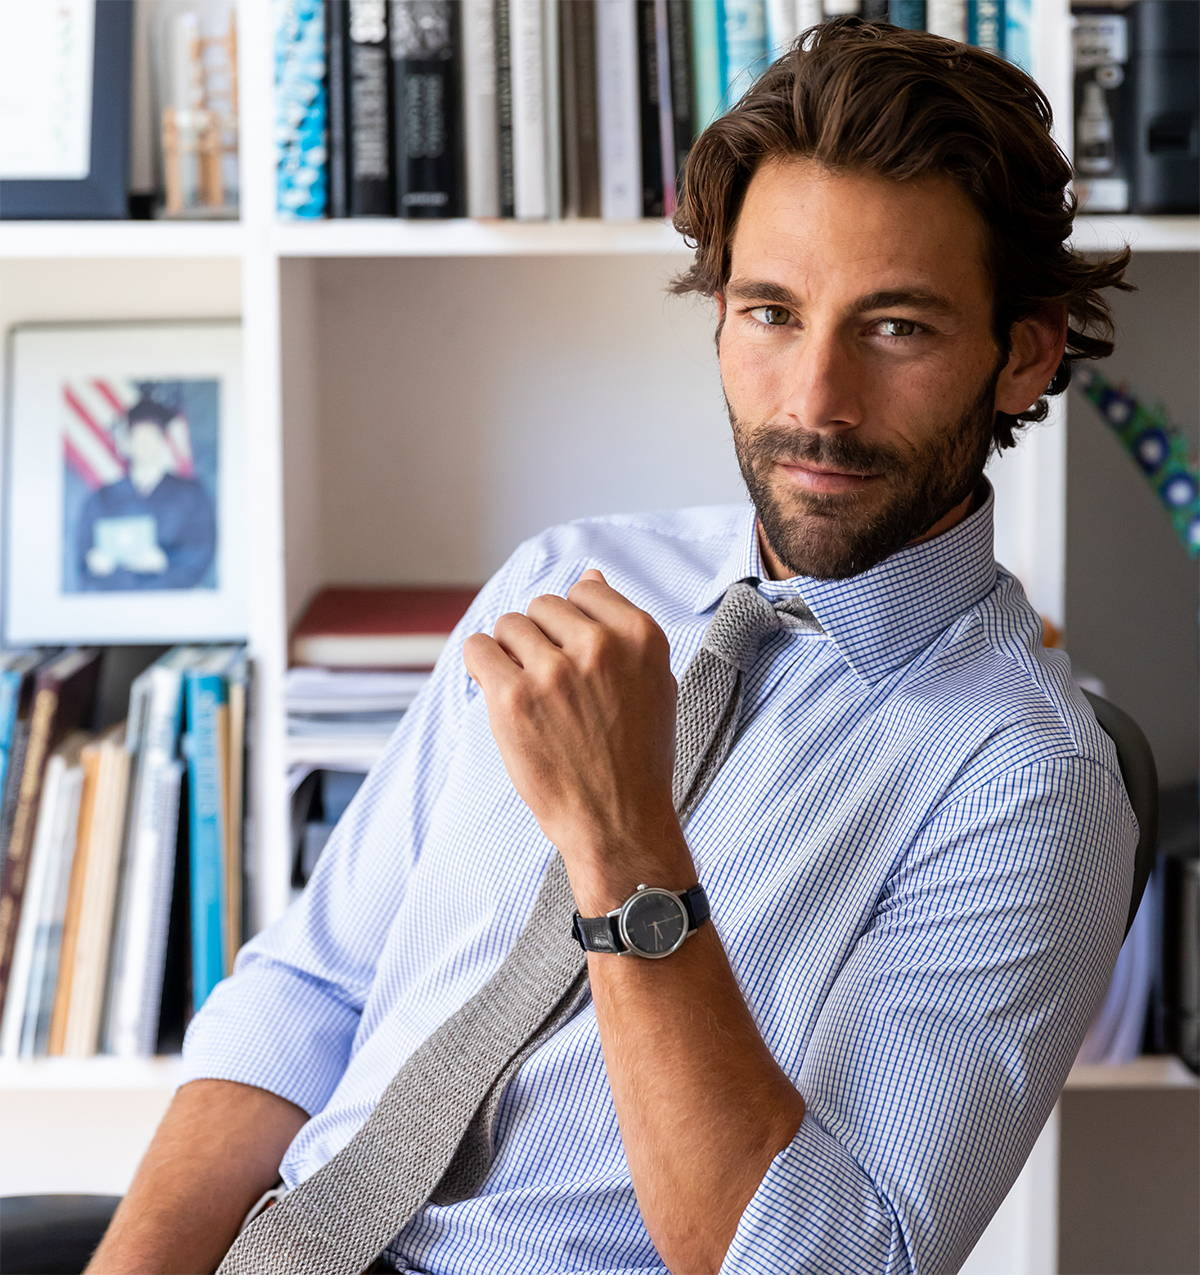 Man sitting in chair wearing Ledbury dress shirt and Ledbury tie